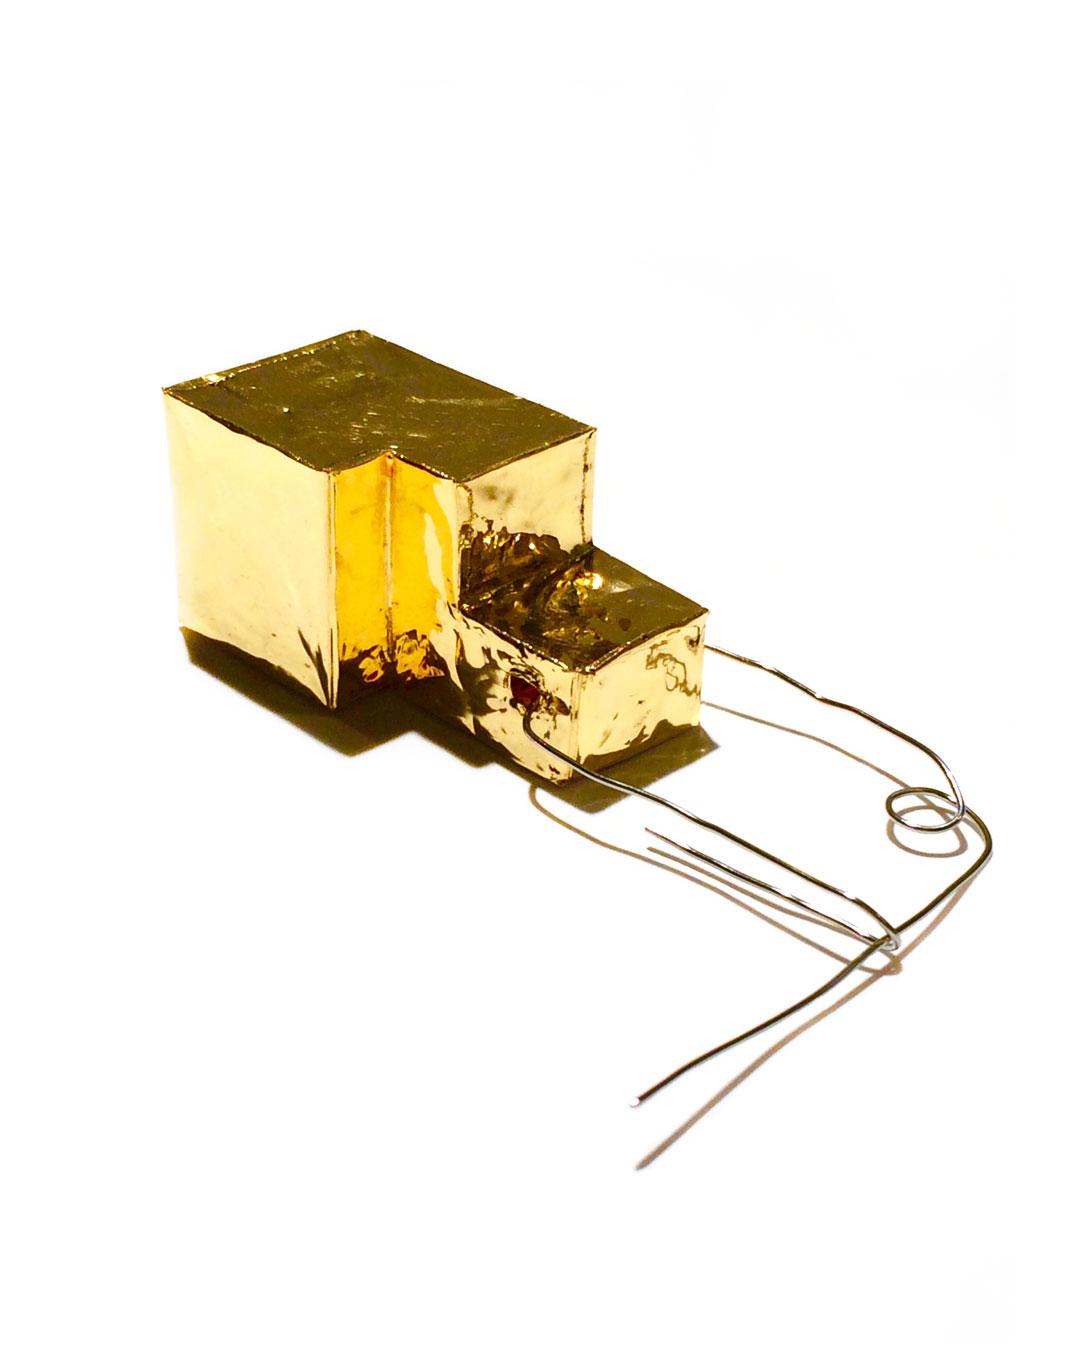 Carla Nuis, Unfurl999#1, 2018, brooch; fine gold, menzanium, 50 x 25 x 25 mm, €2800